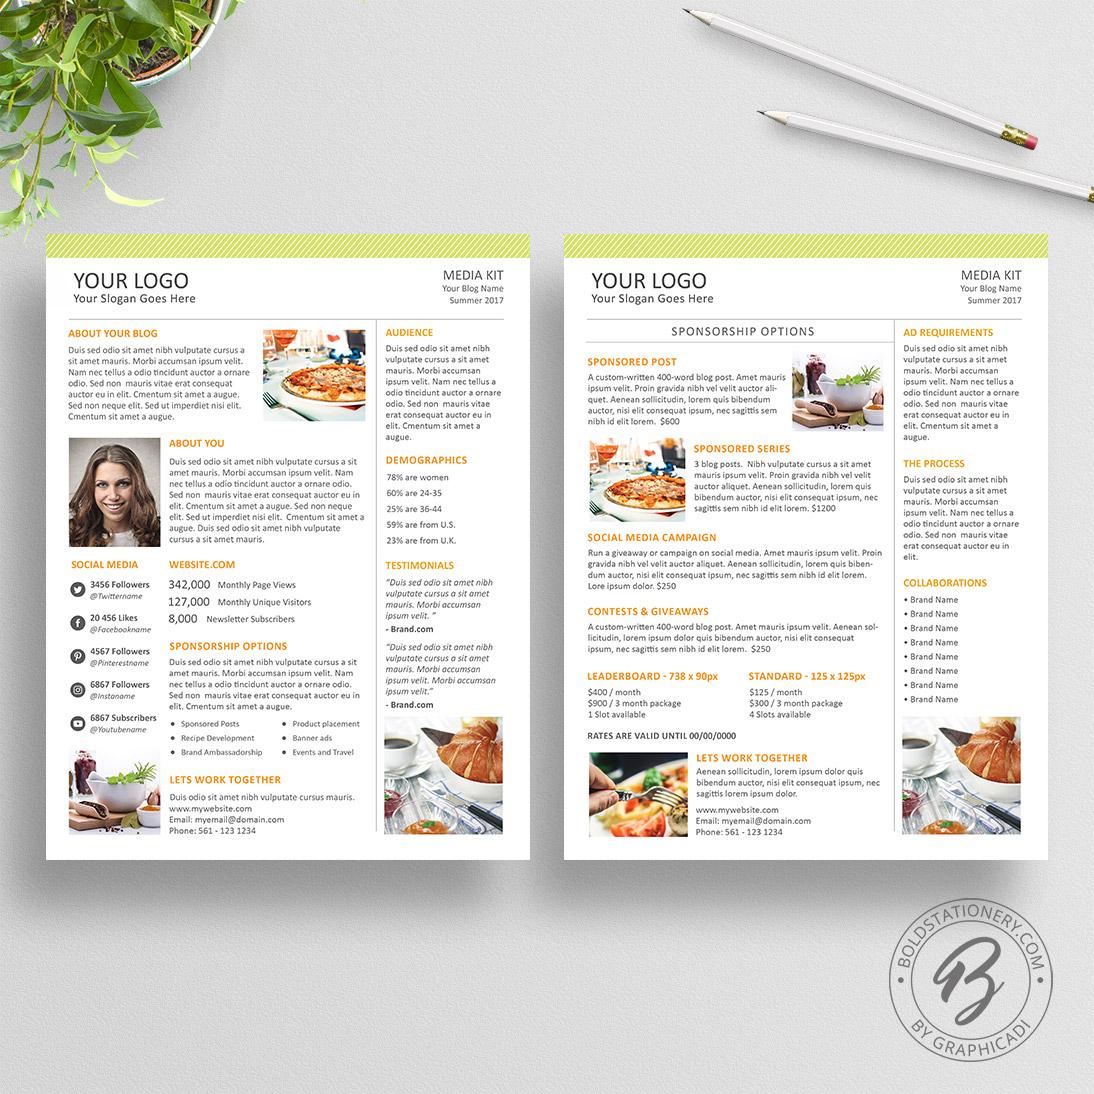 Media Kit Template | Media Kit Template 02 Graphicadi